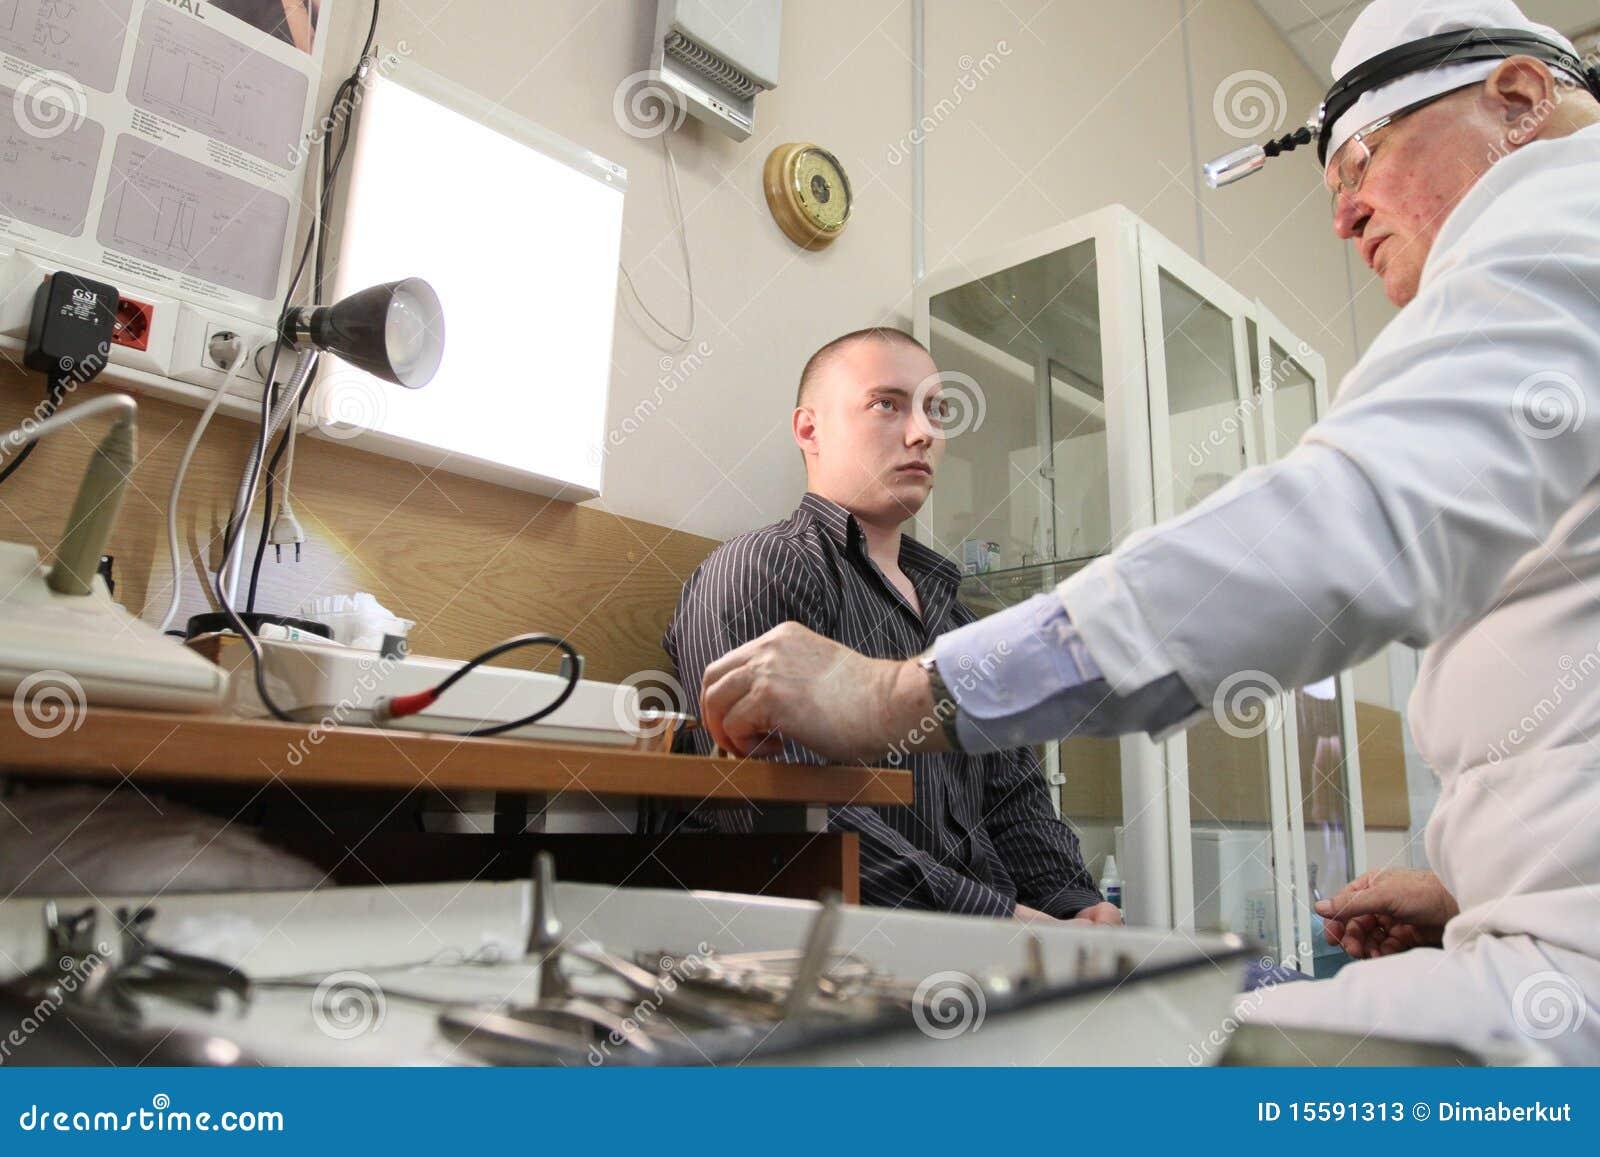 60 Top Medical Examination Recruits Pictures, Photos